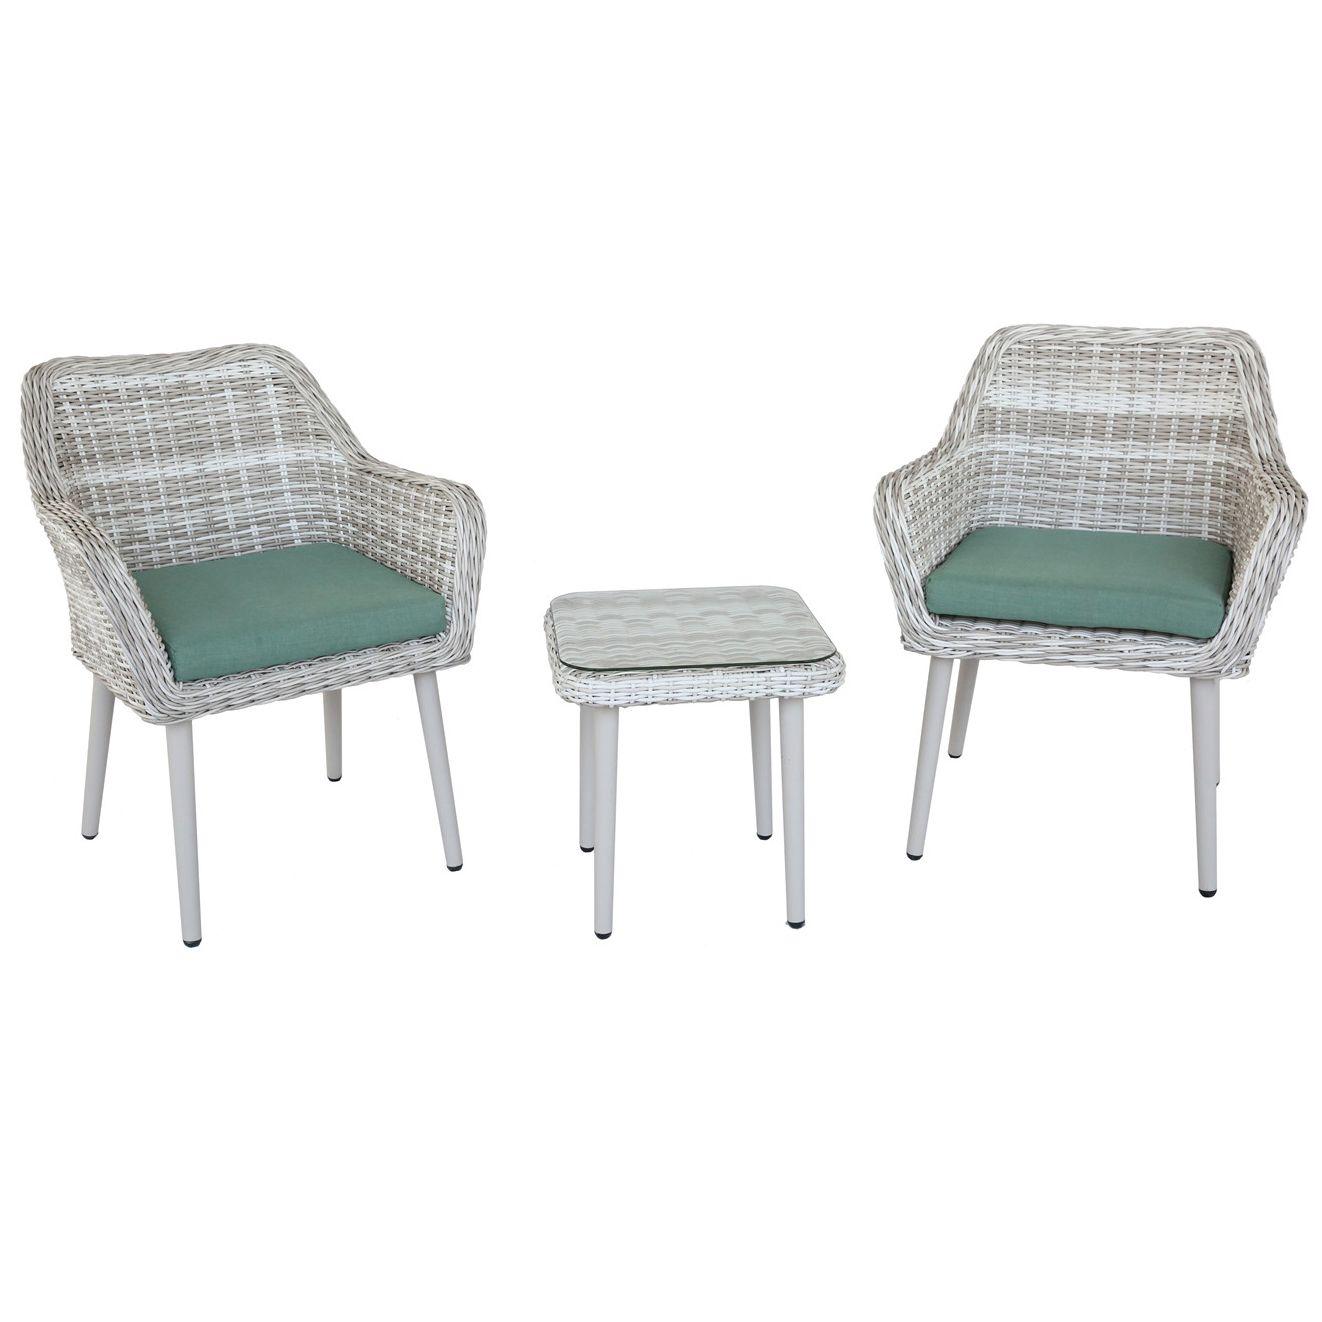 Set mobilier gradina/terasa Kring Nisa, masa + 2 fotolii, Bej/Verde